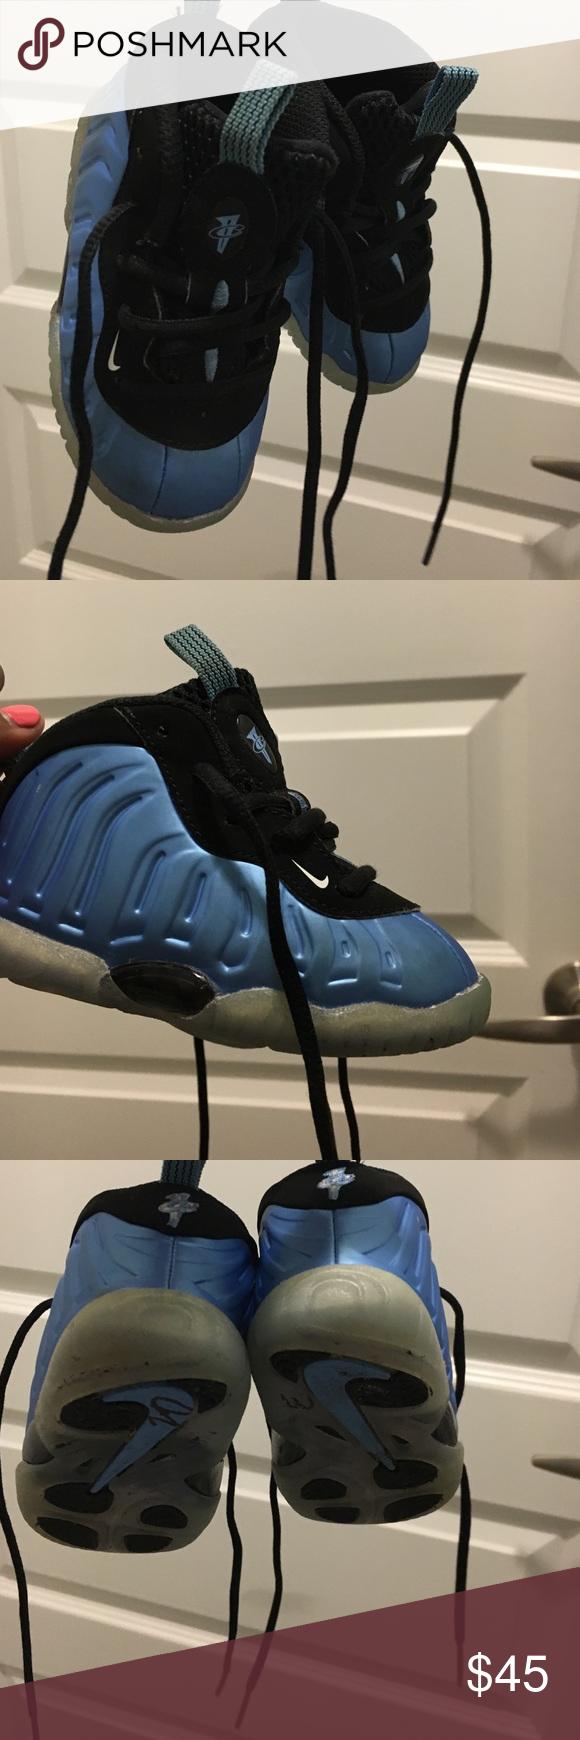 e76ca87681d7 University blue (KIDS) FOAMPOSITES Nike Air Foamposite One